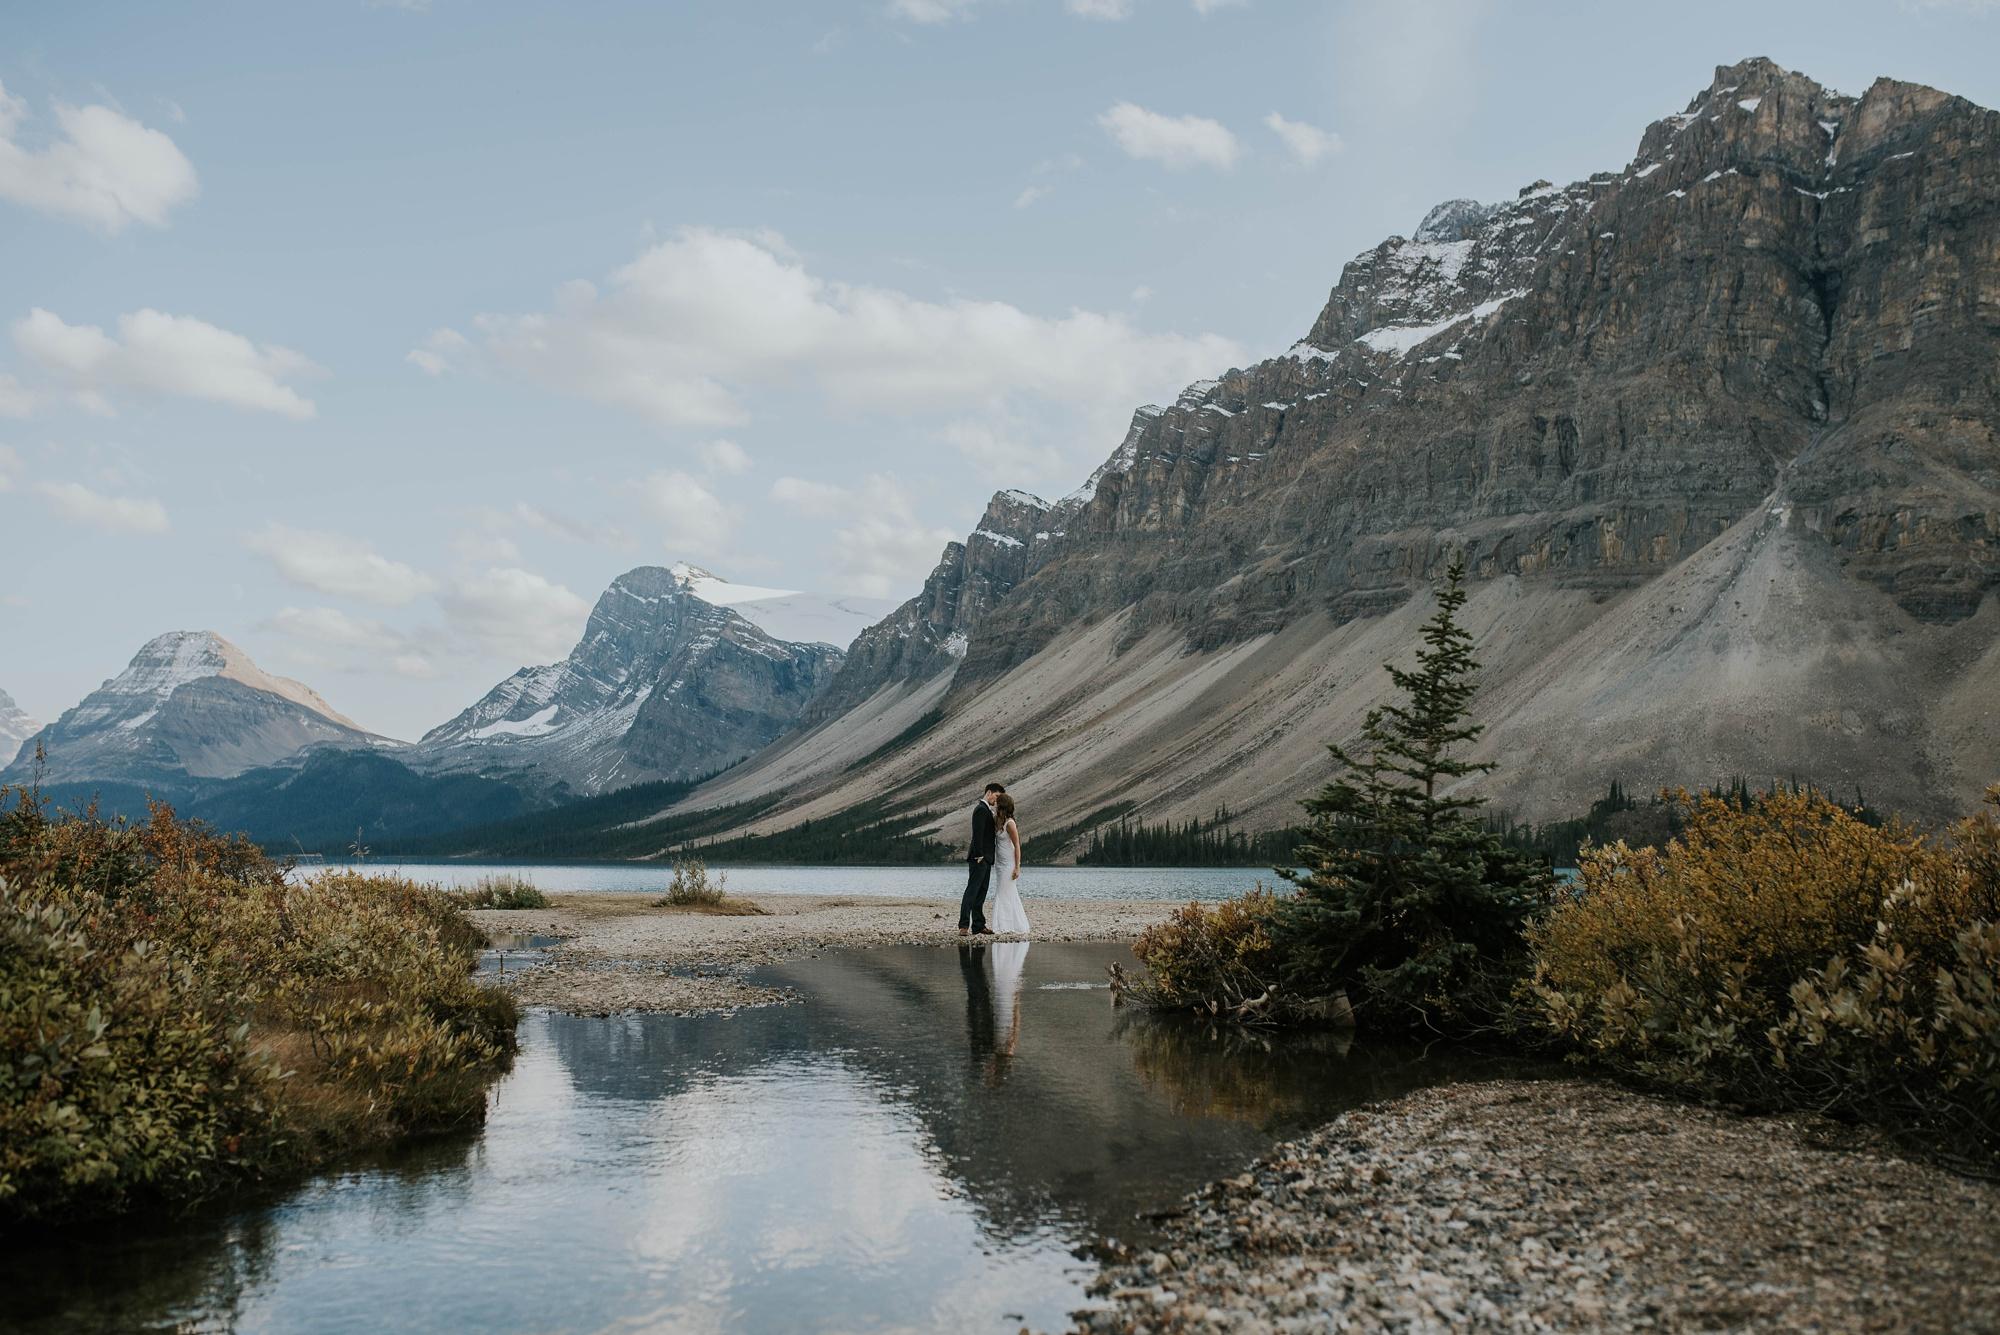 bride and groom walk along bow lake during intimate Peyto Lake elopement